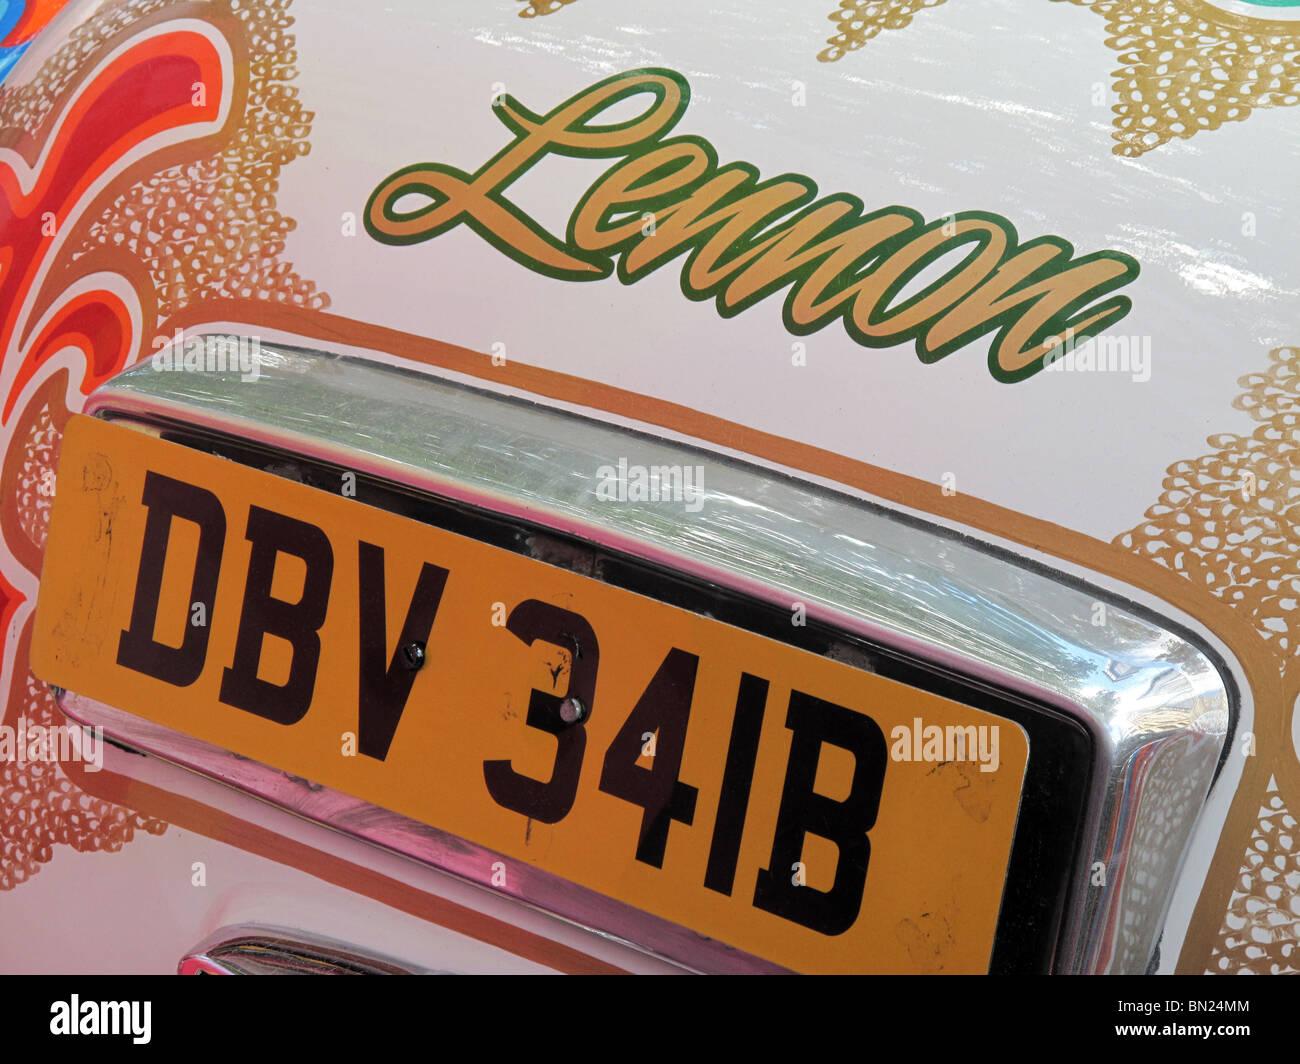 John Lennon Beatles Rolls Royce Psychedelic 1967 60s Hippy Trip - Stock Image